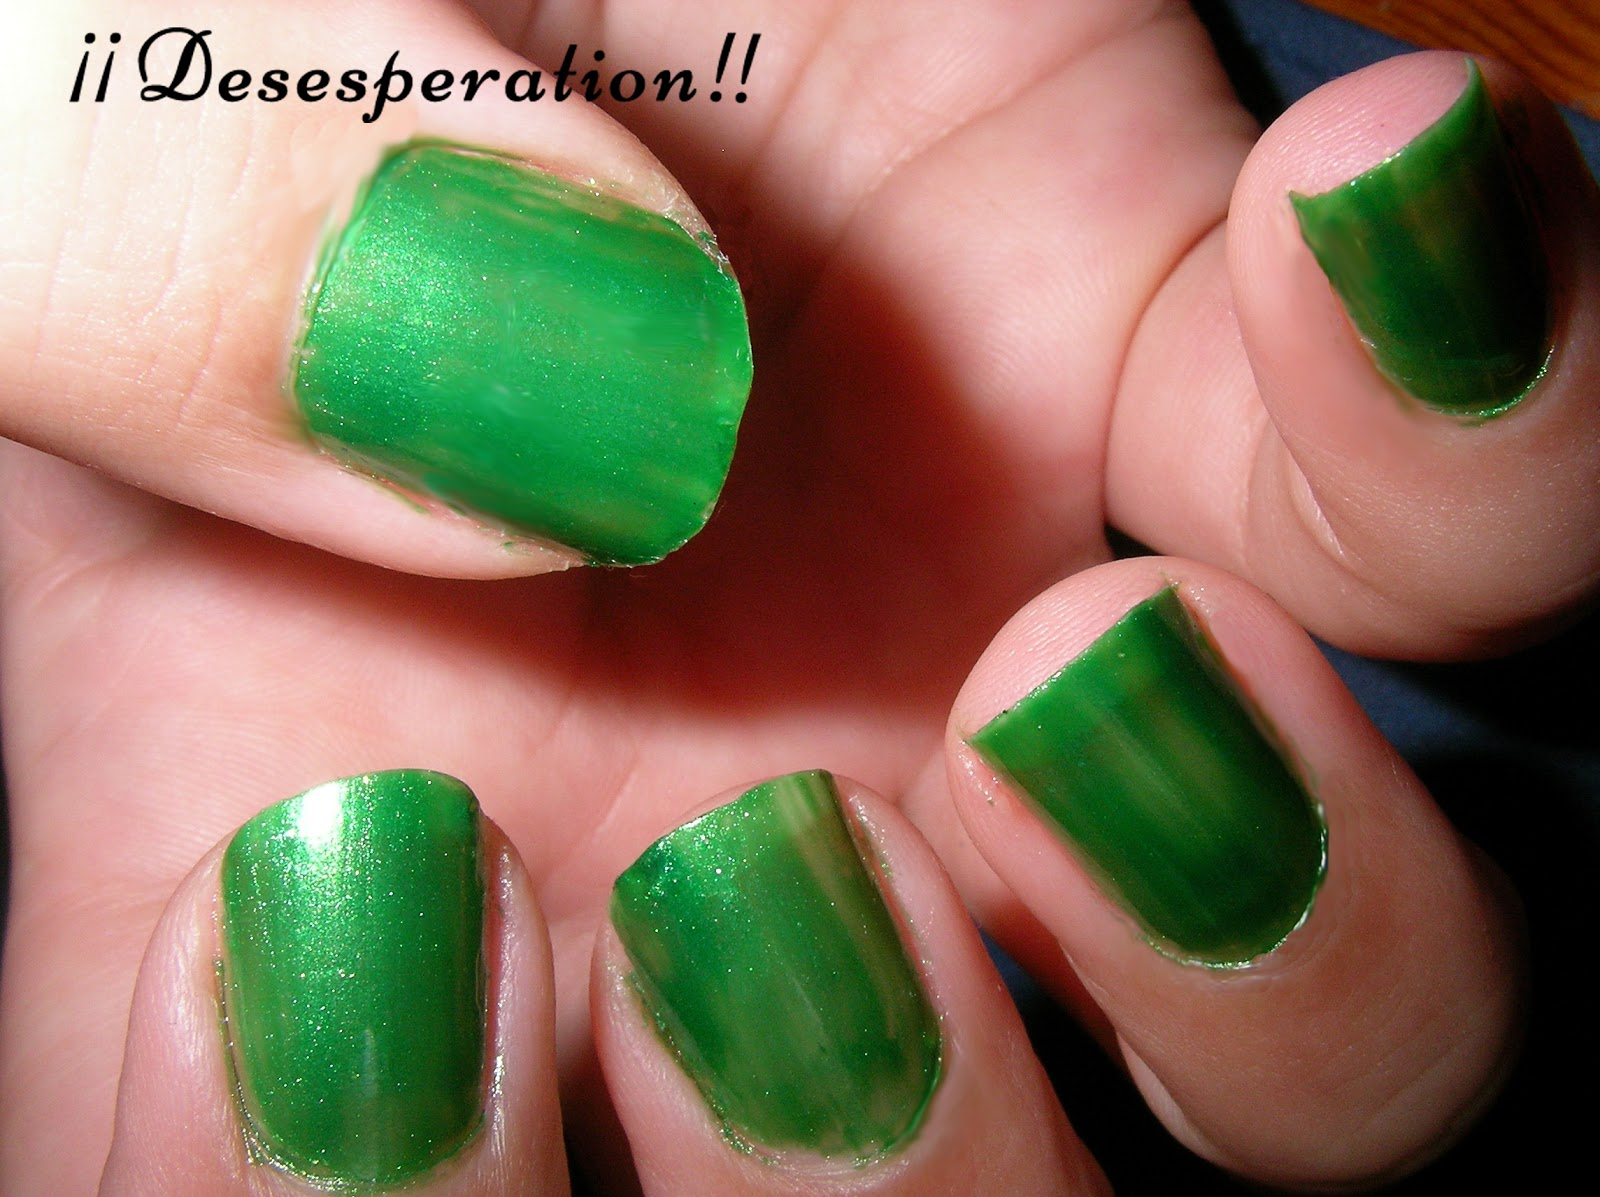 Desesperation!!: diciembre 2012